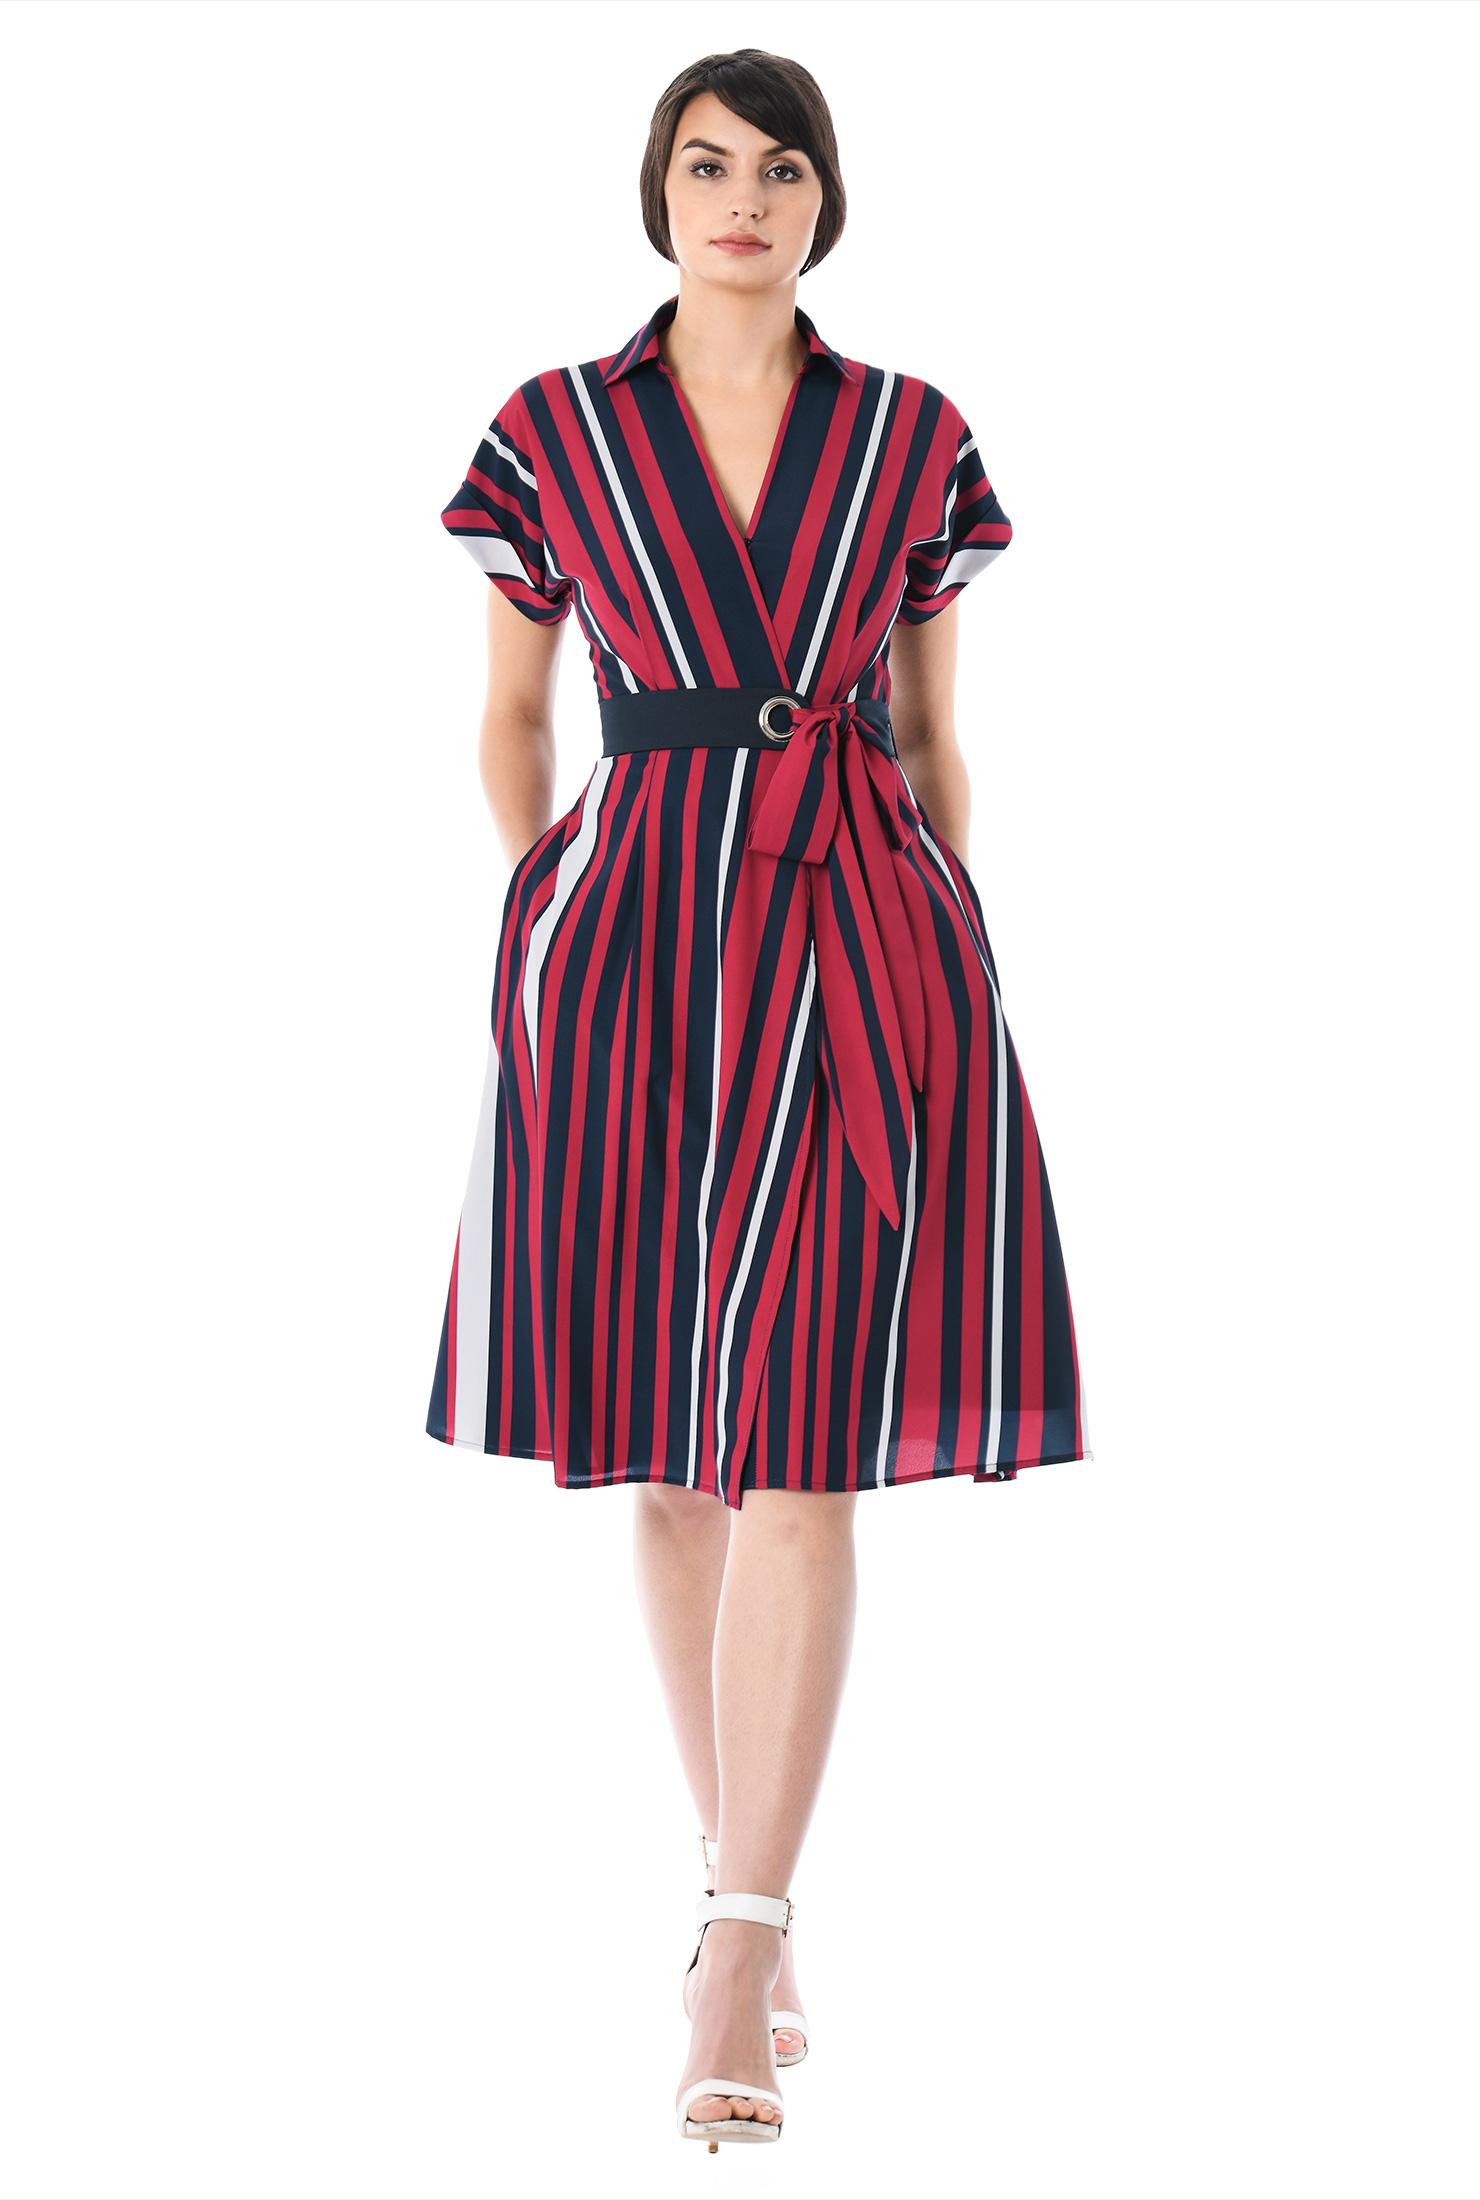 f65e4a3439de Women s Fashion Clothing 0-36W and Custom